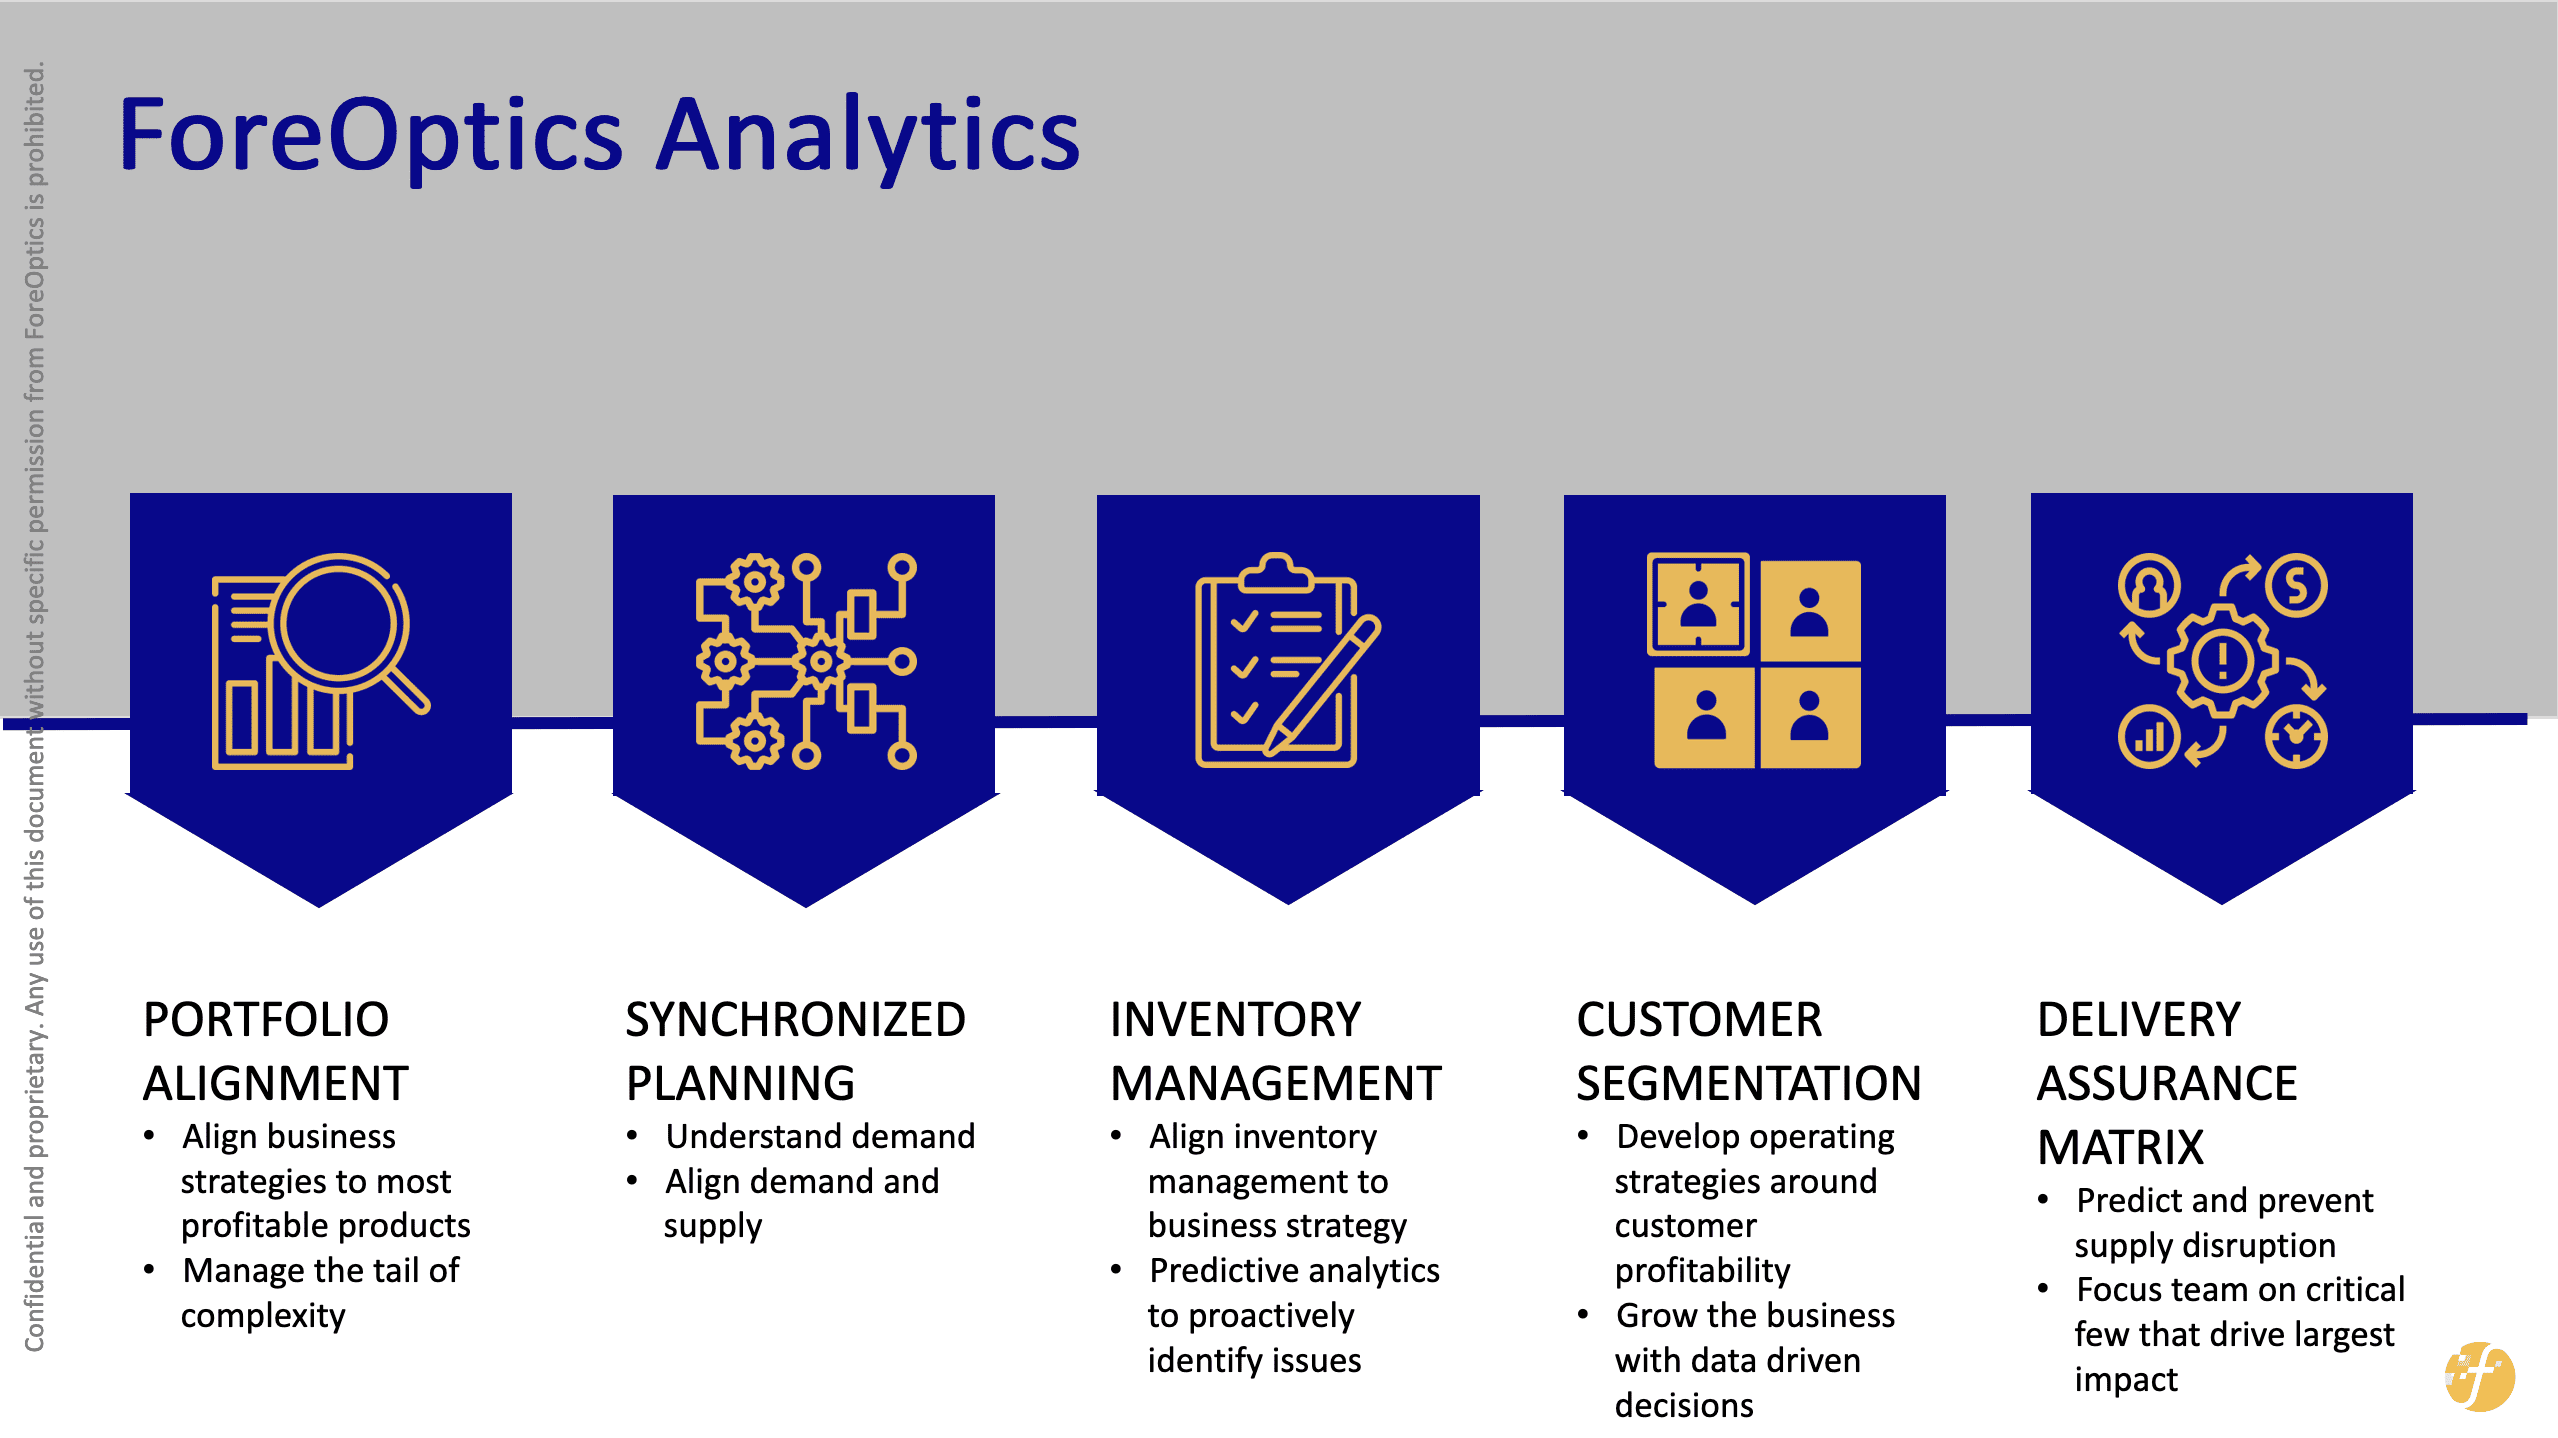 ForeOptics Analytics Offerings - Portfolio Alignment, Synchronized Planning, Inventory Management, Customer Segmentation, Delivery Assurance Matrix